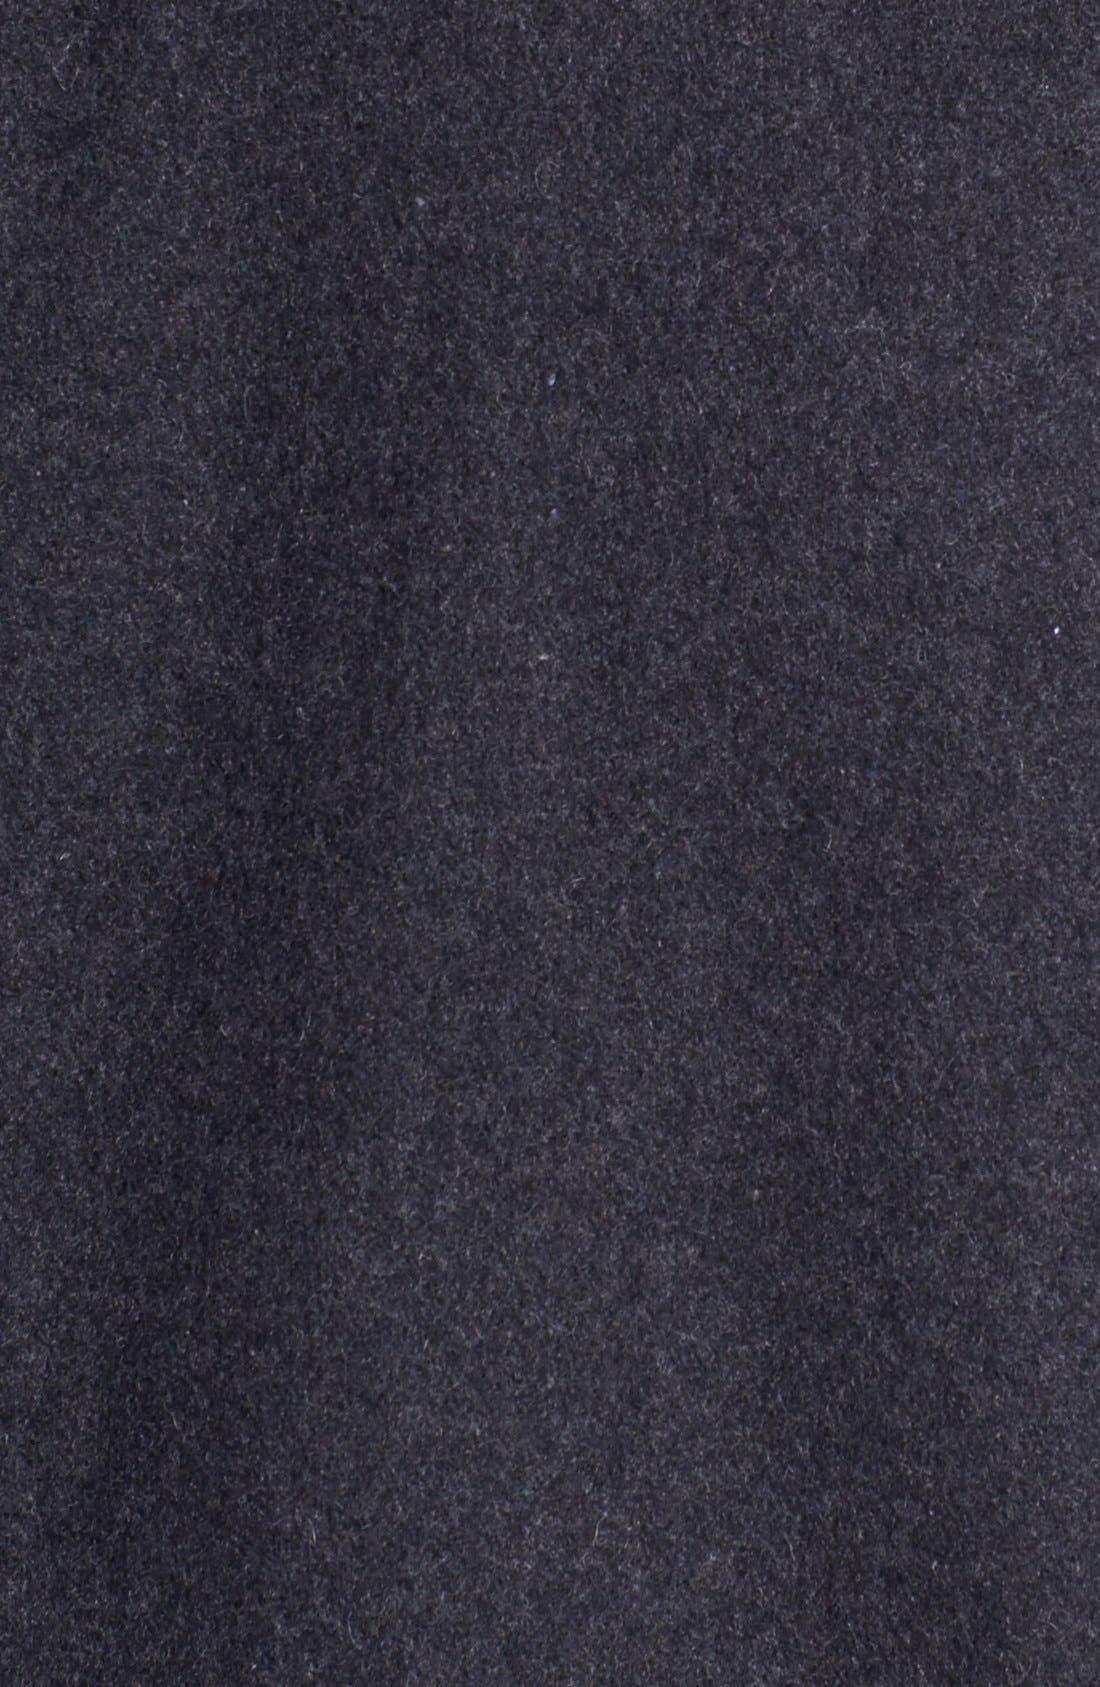 Alternate Image 3  - Kenneth Cole New York Melton Wool Peacoat